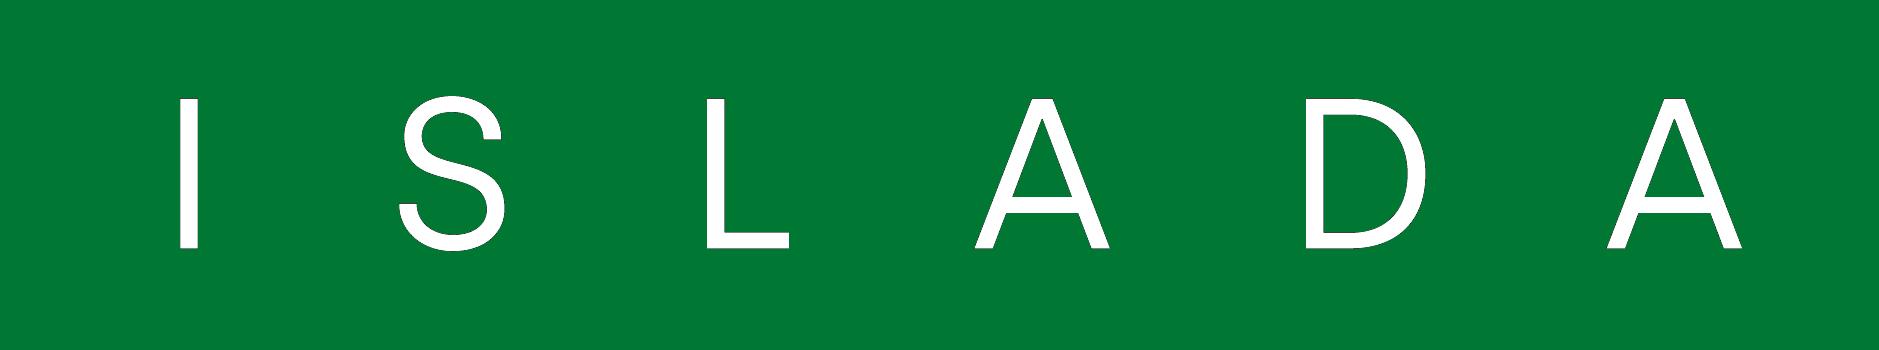 ISLADA